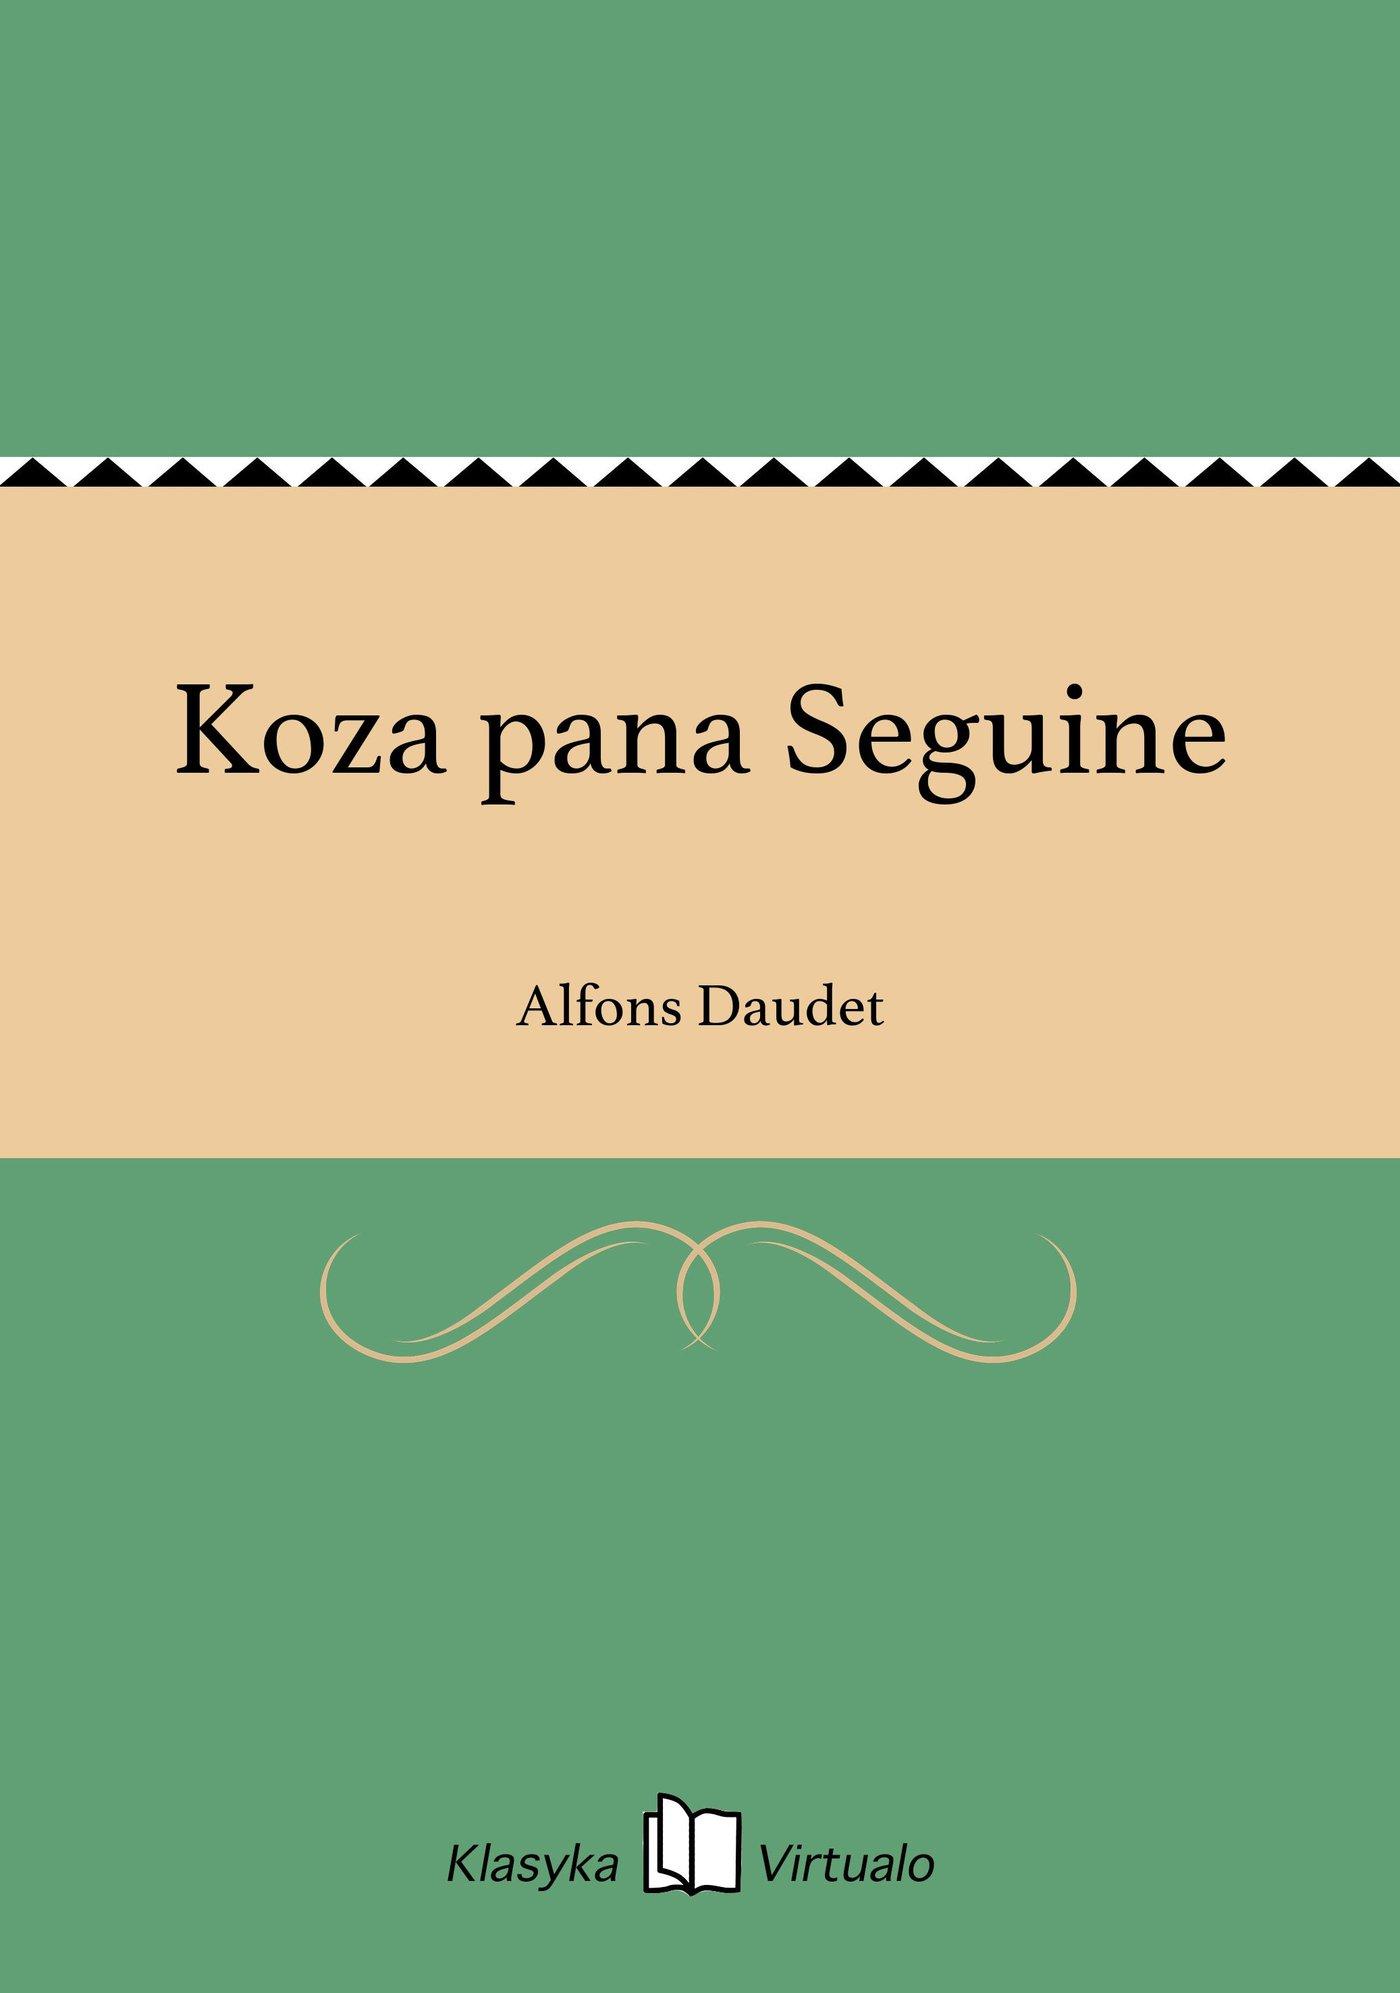 Koza pana Seguine - Ebook (Książka na Kindle) do pobrania w formacie MOBI